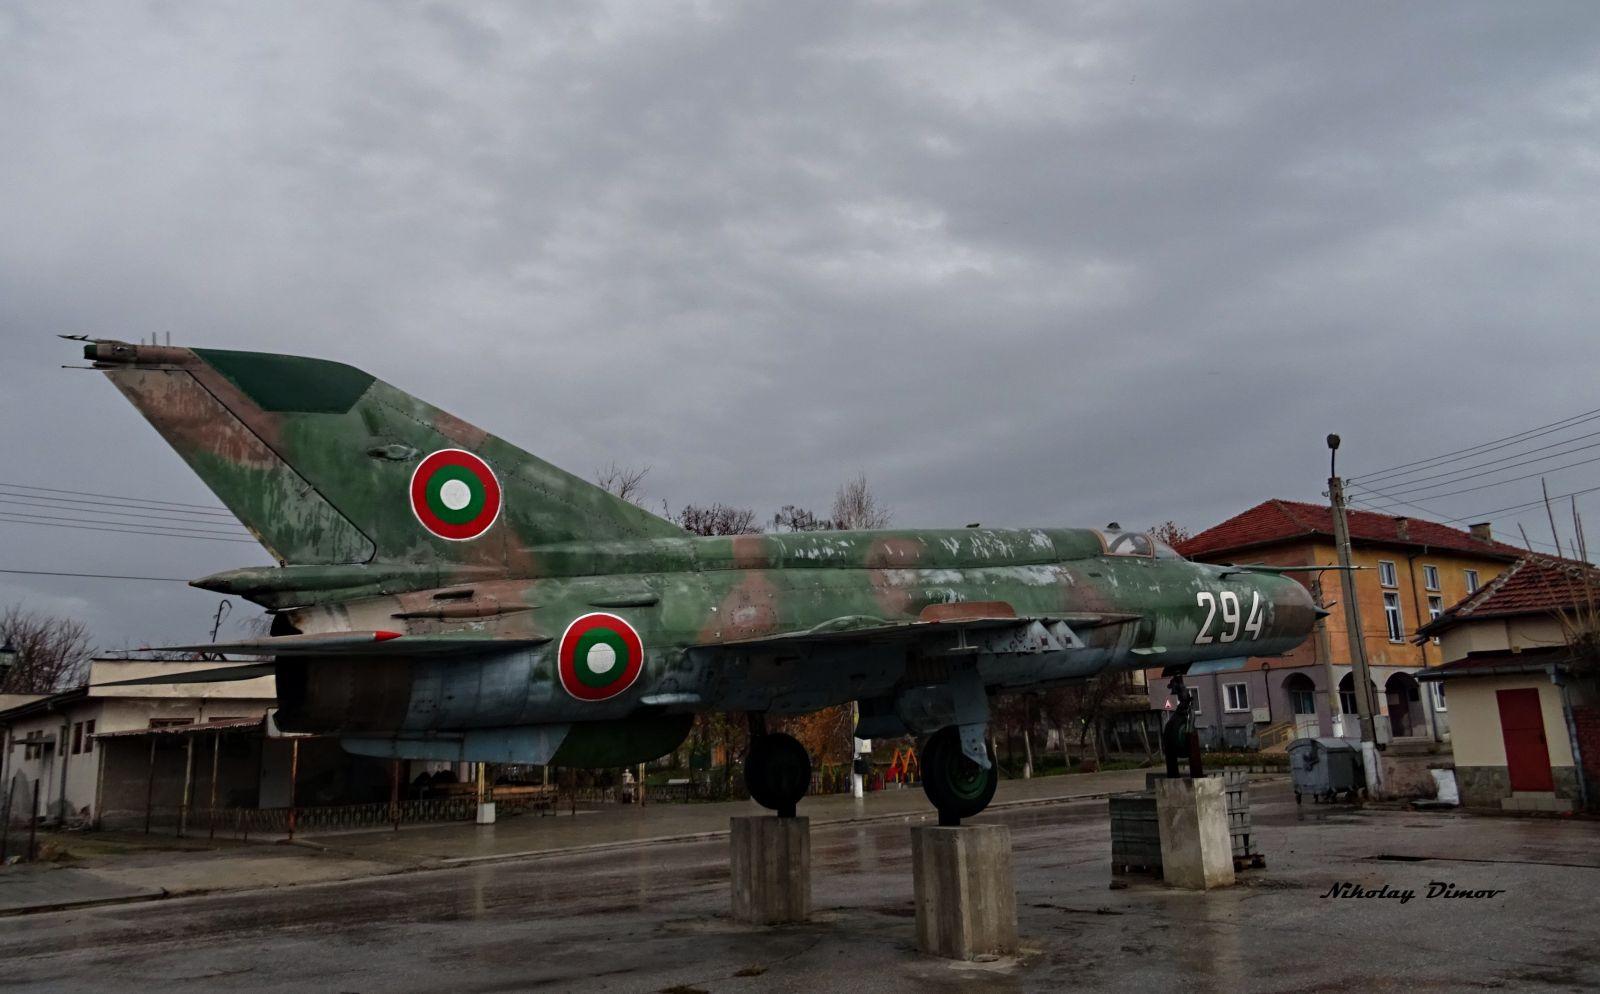 """Последен пристан"" (част 5) :  МиГ-21бис борд ""294"" – село Ахматово"